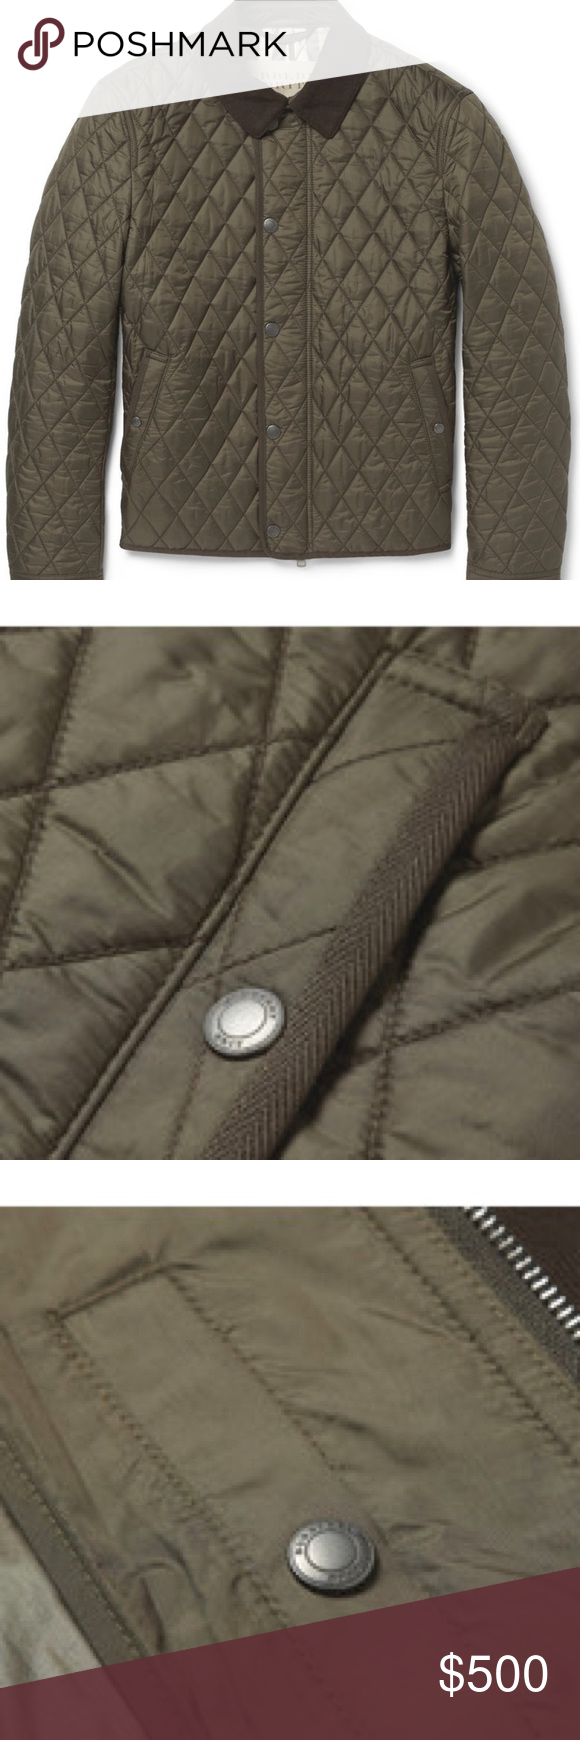 Men S Burberry Brit Corduroy Collar Quilted Jacket Quilted Jacket Burberry Brit Burberry